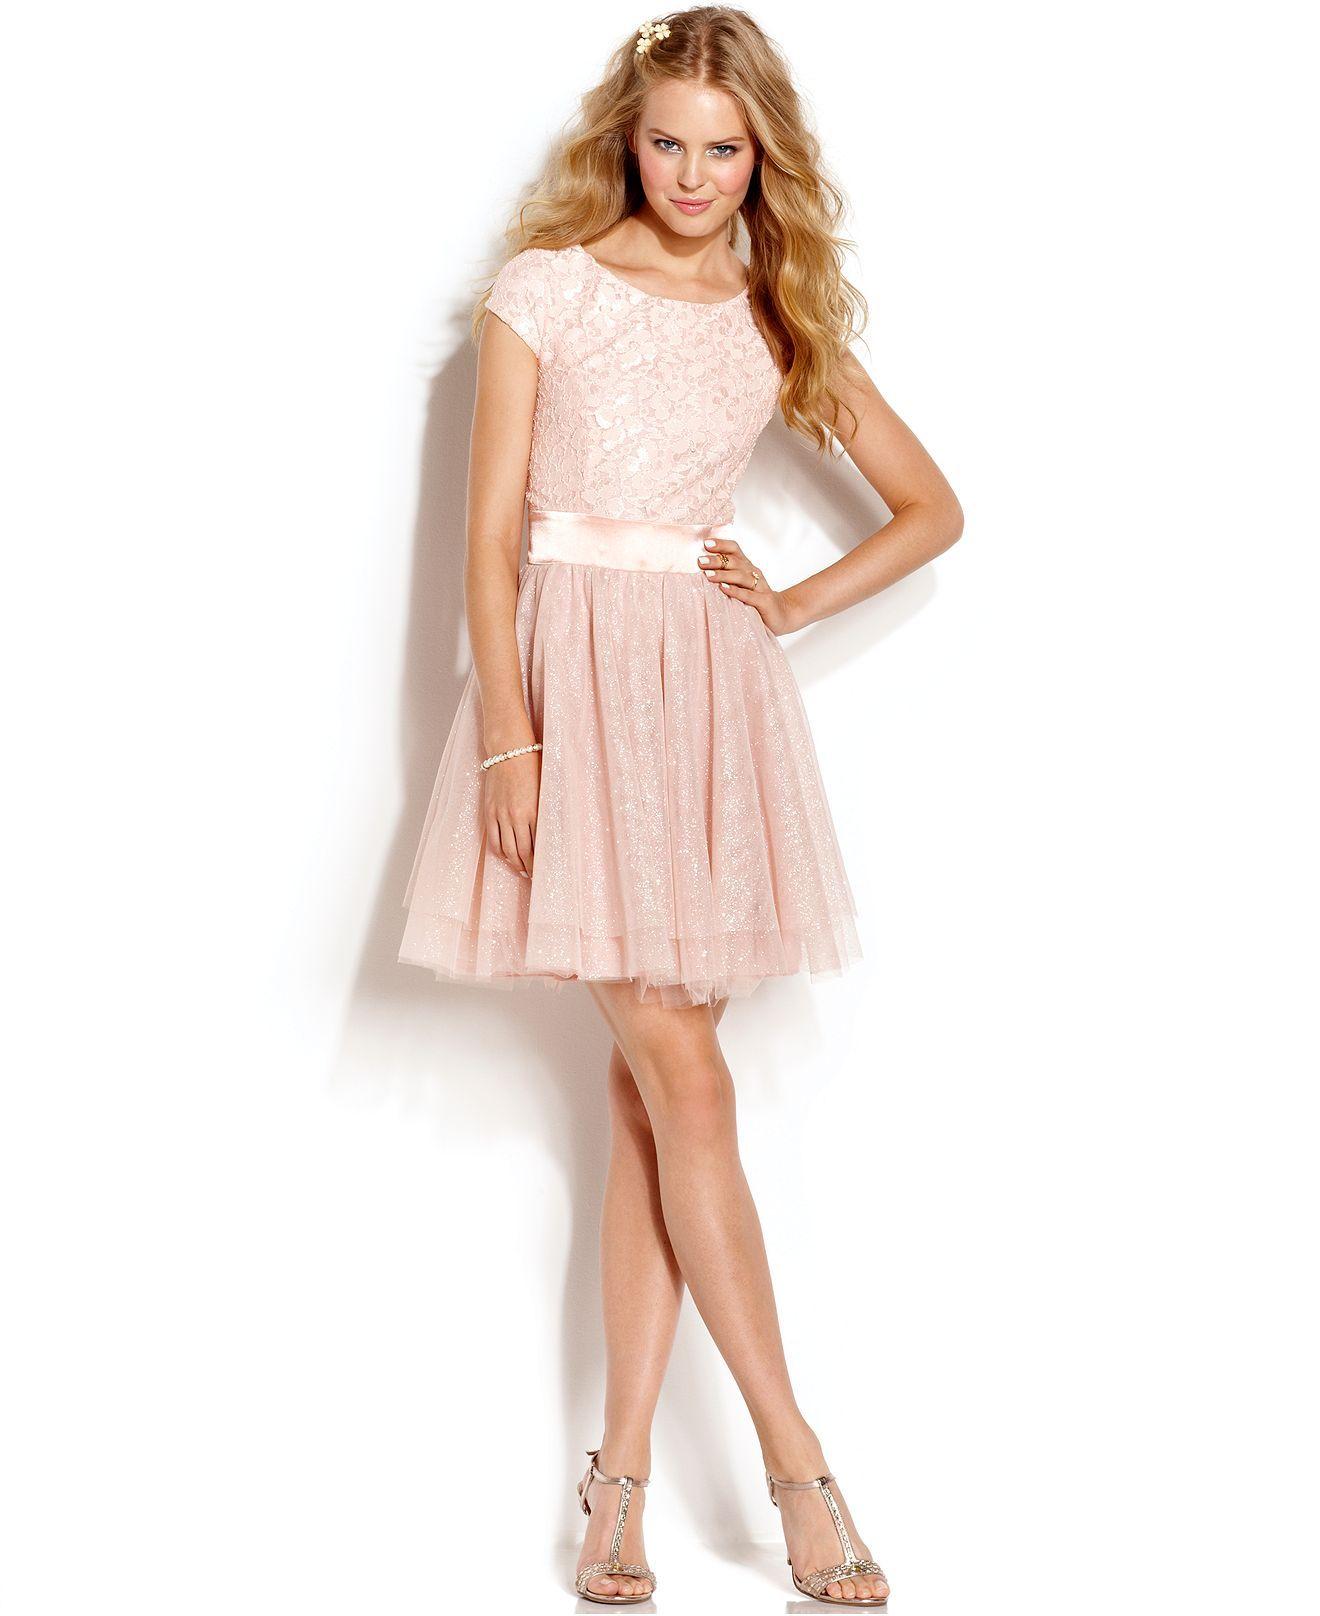 Trixxi juniorsu lace glittered tulle dress juniors dresses